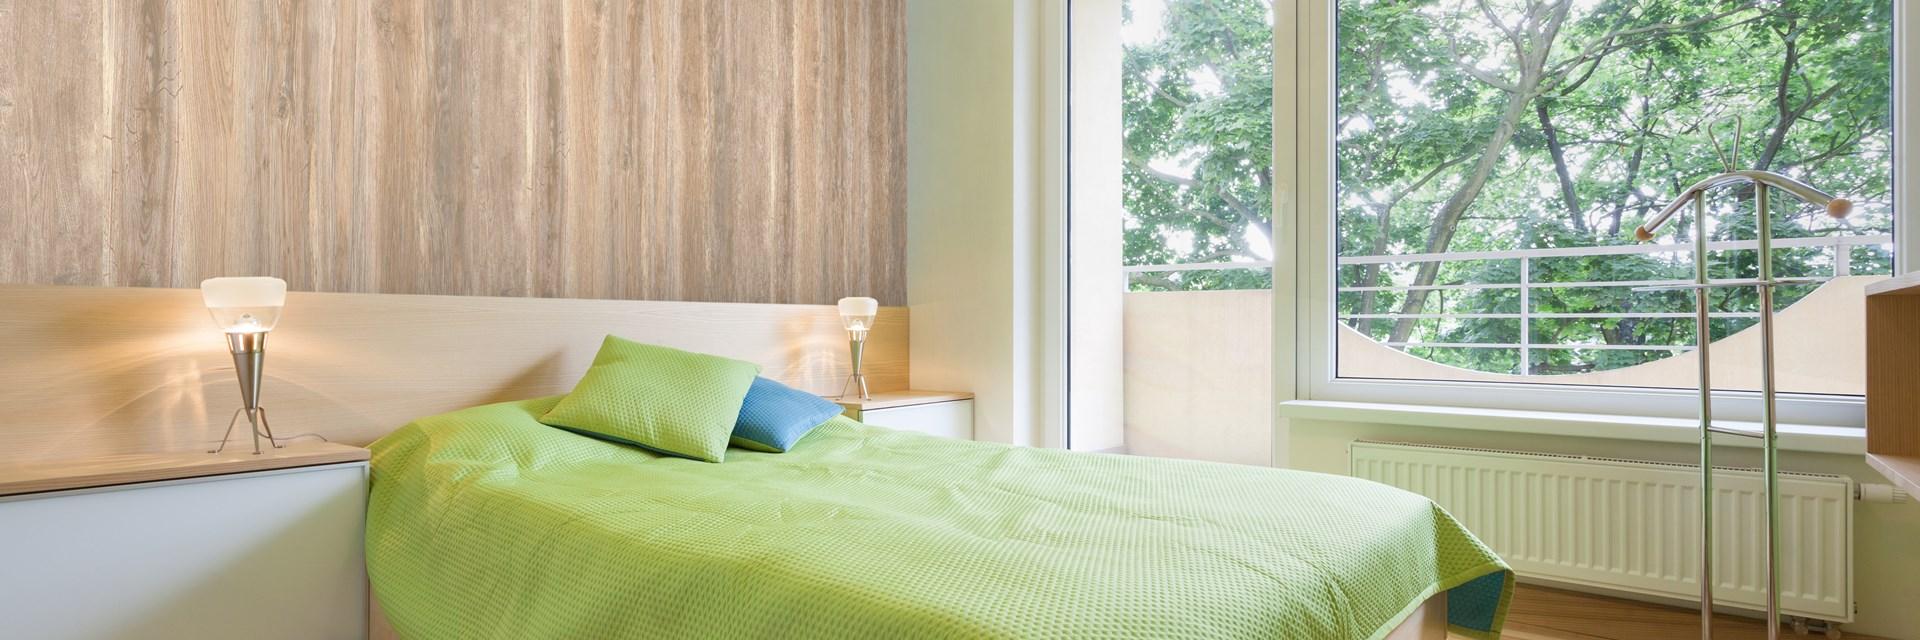 dormitorio-simplisima